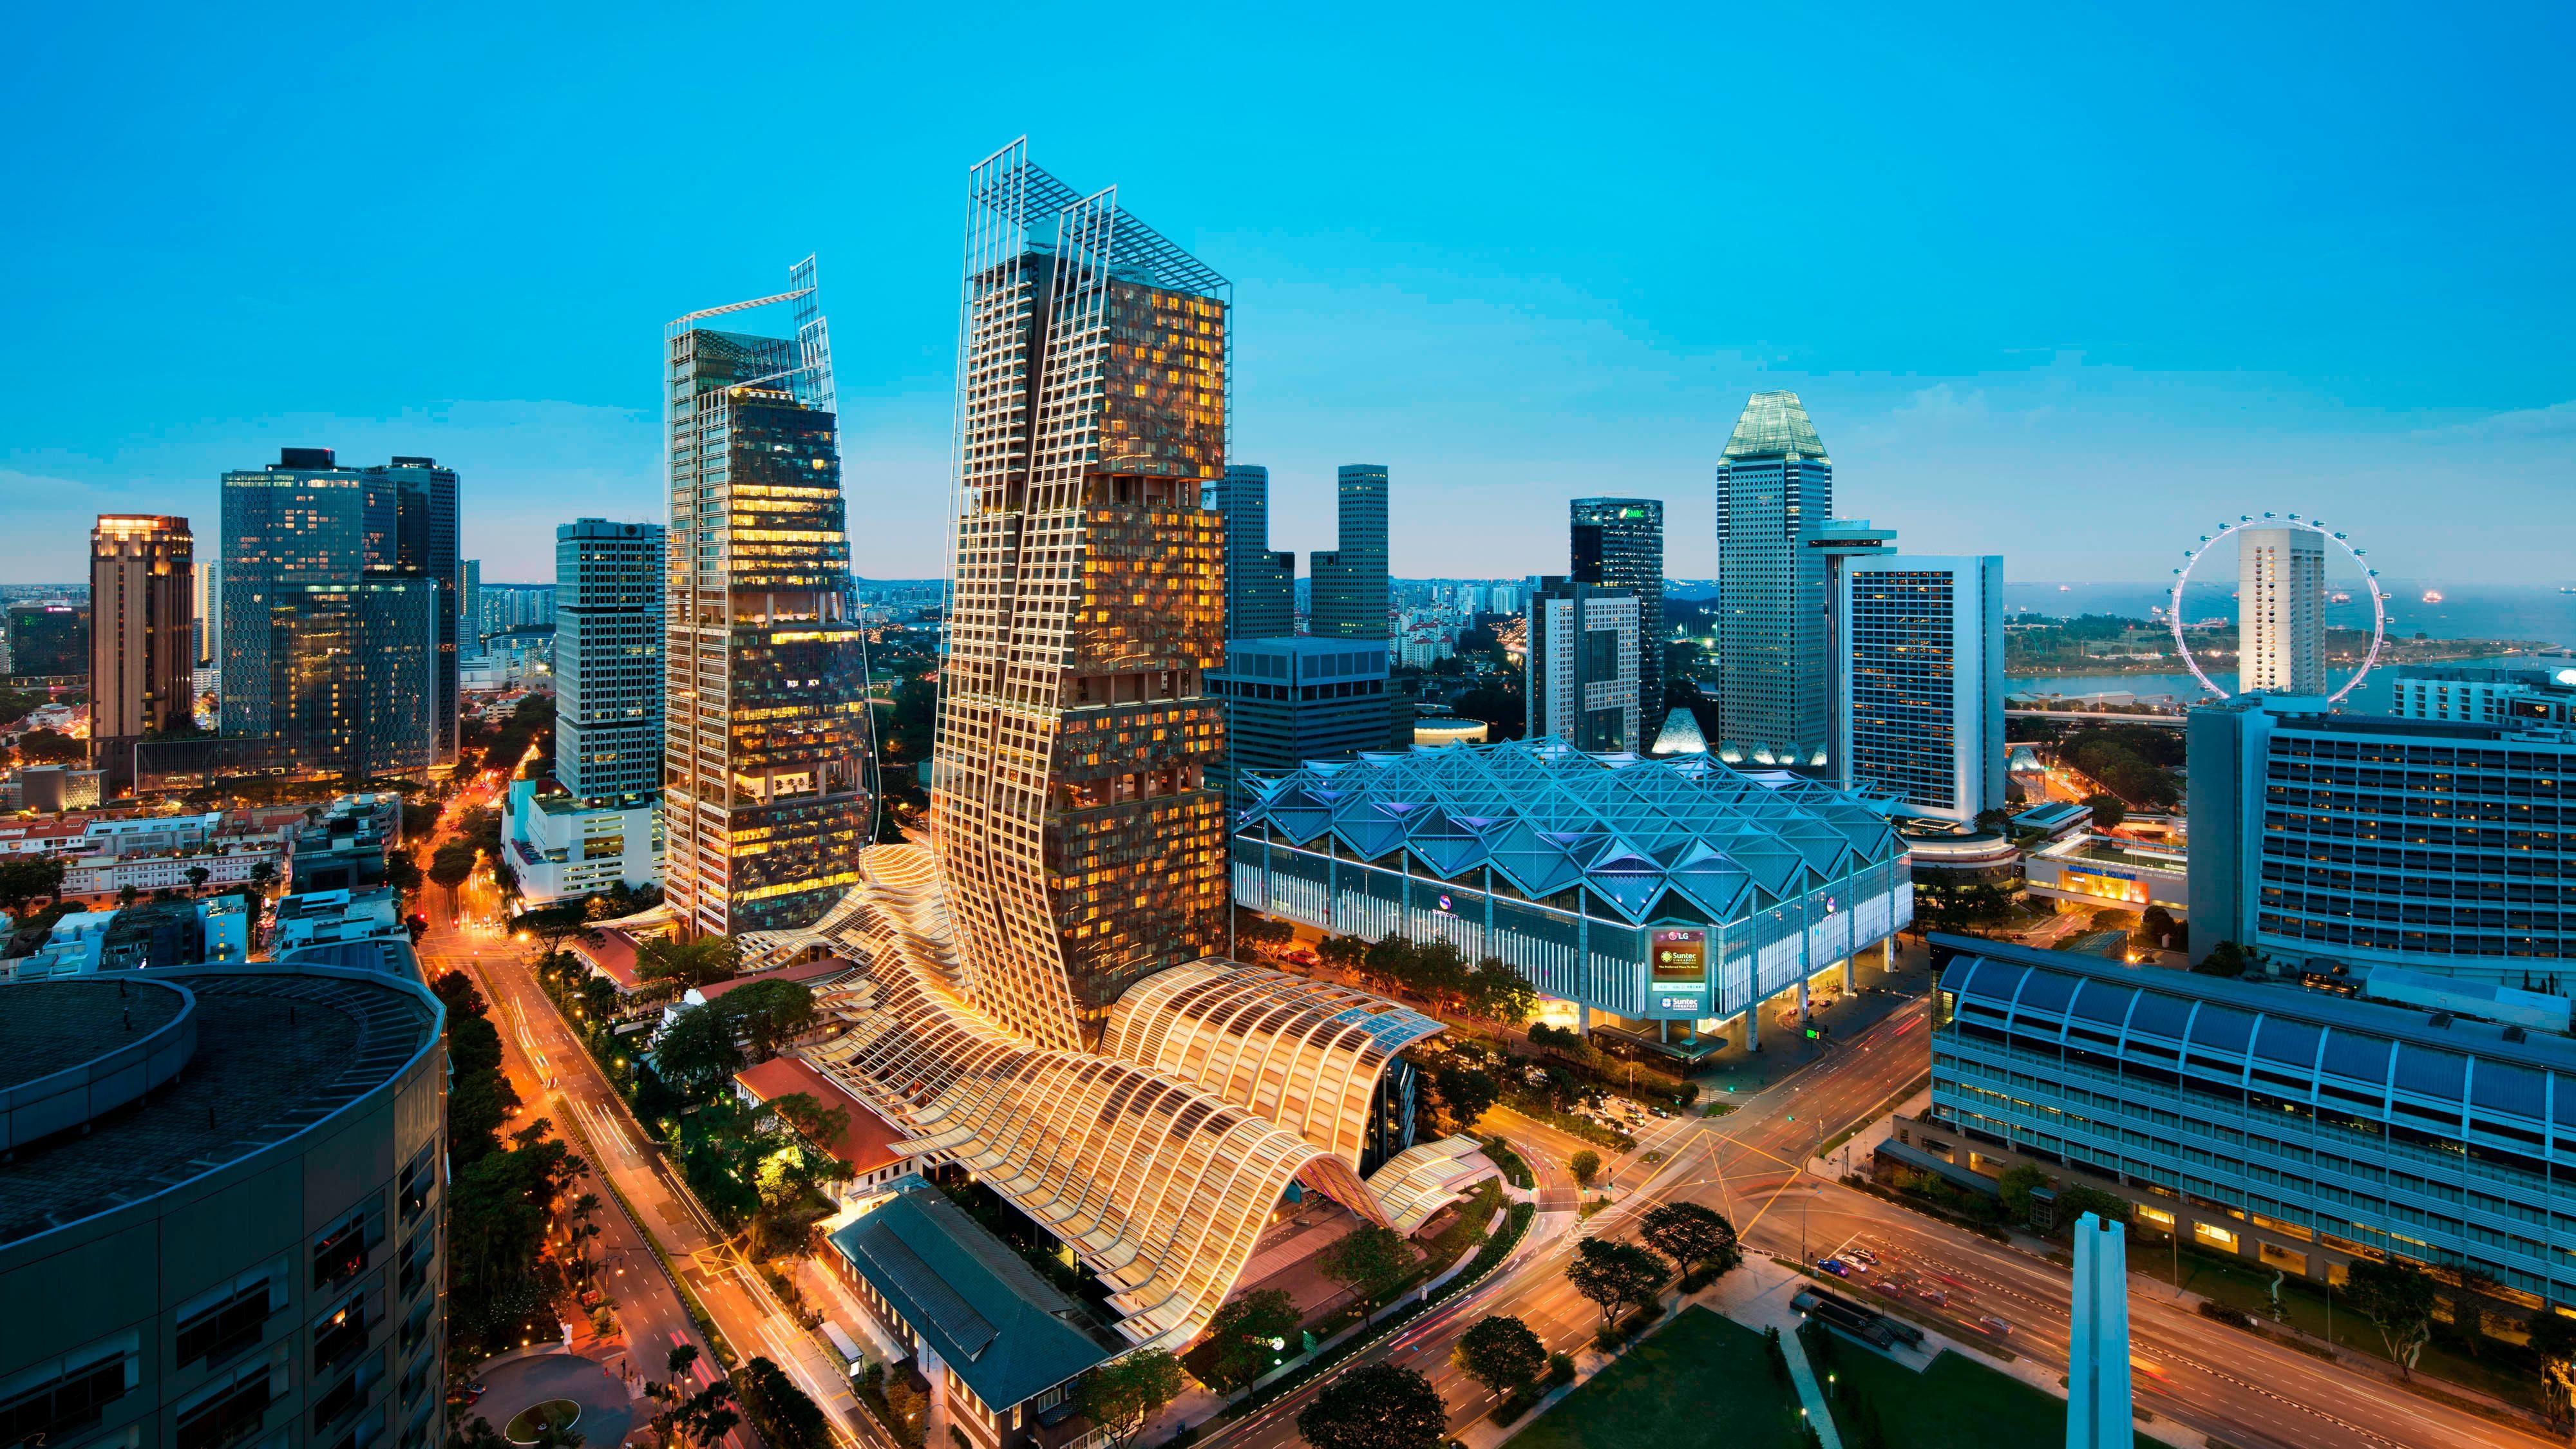 5 Star Designer Hotel Downtown Singapore City Centre Jw